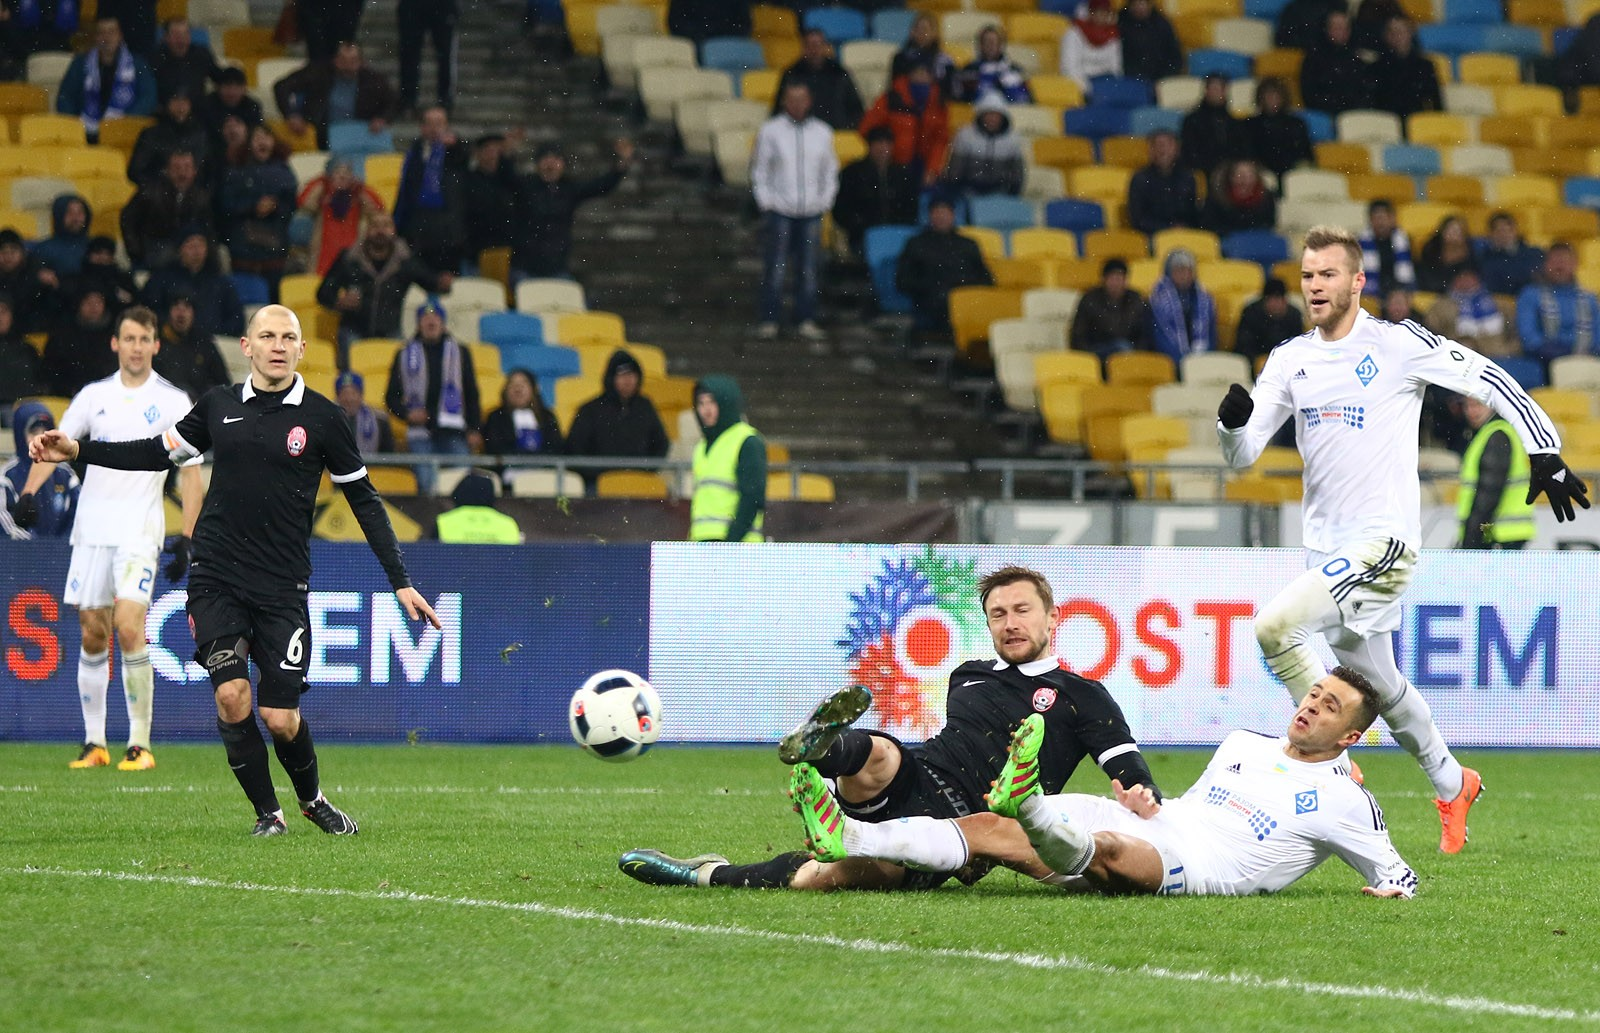 Динамо проиграло Заре иопустилось на 3-е место вчемпионате